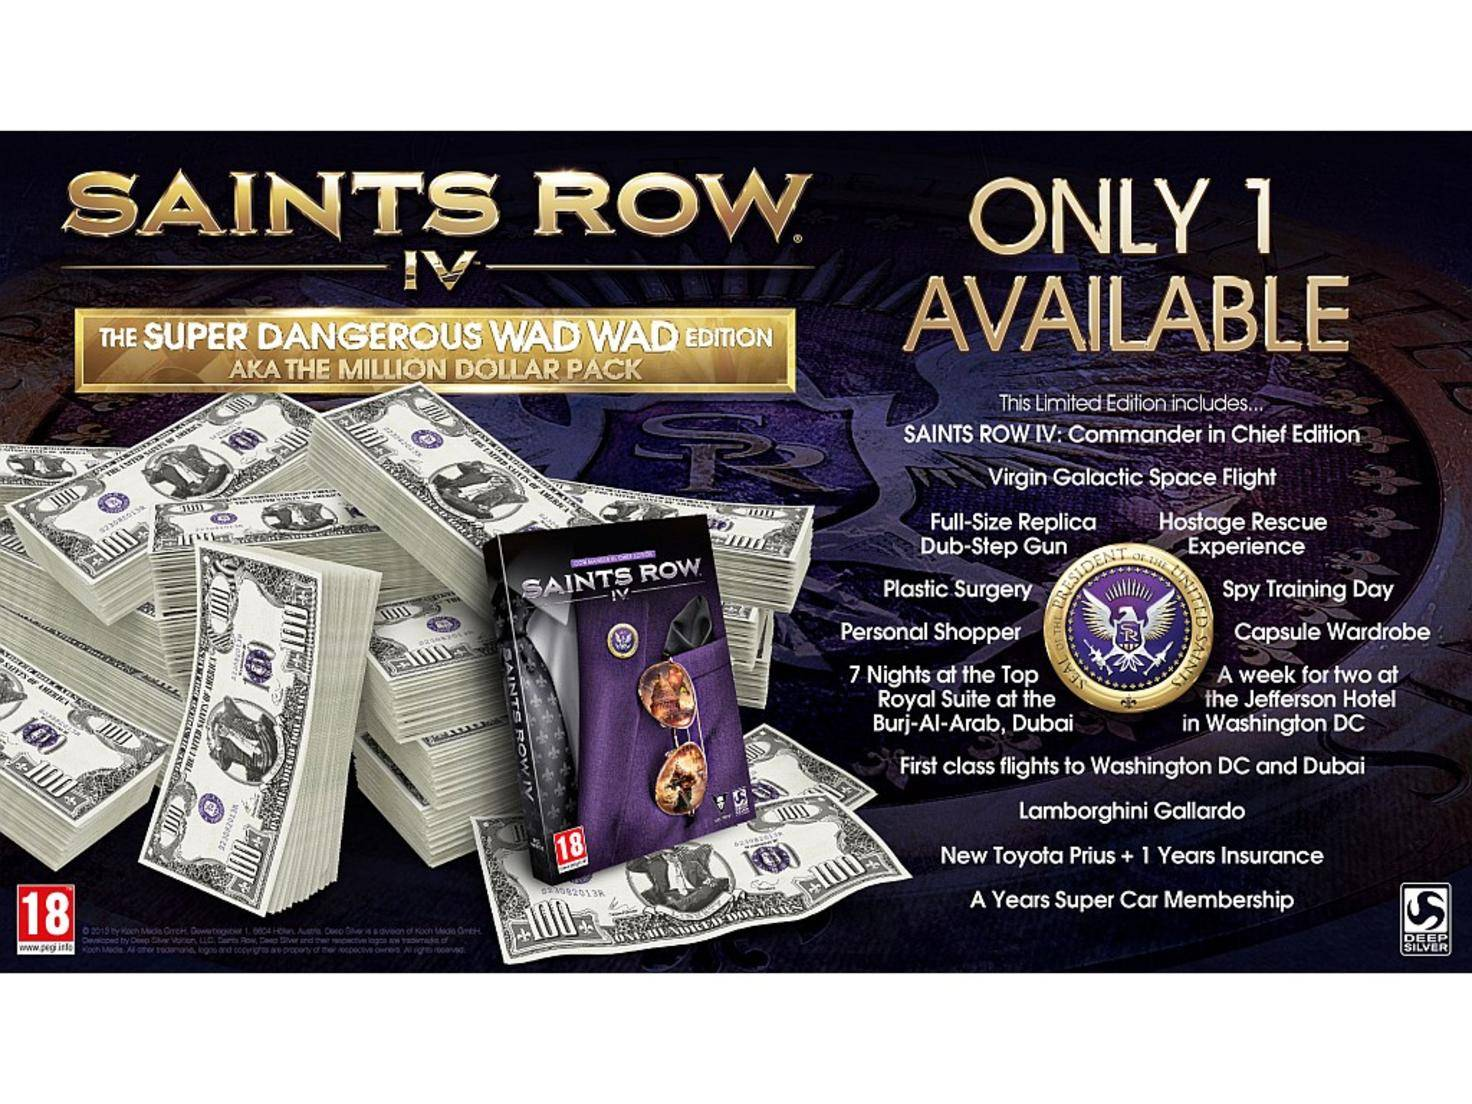 Saints_Row_4_wad_wad_edition-pc-games.jpg